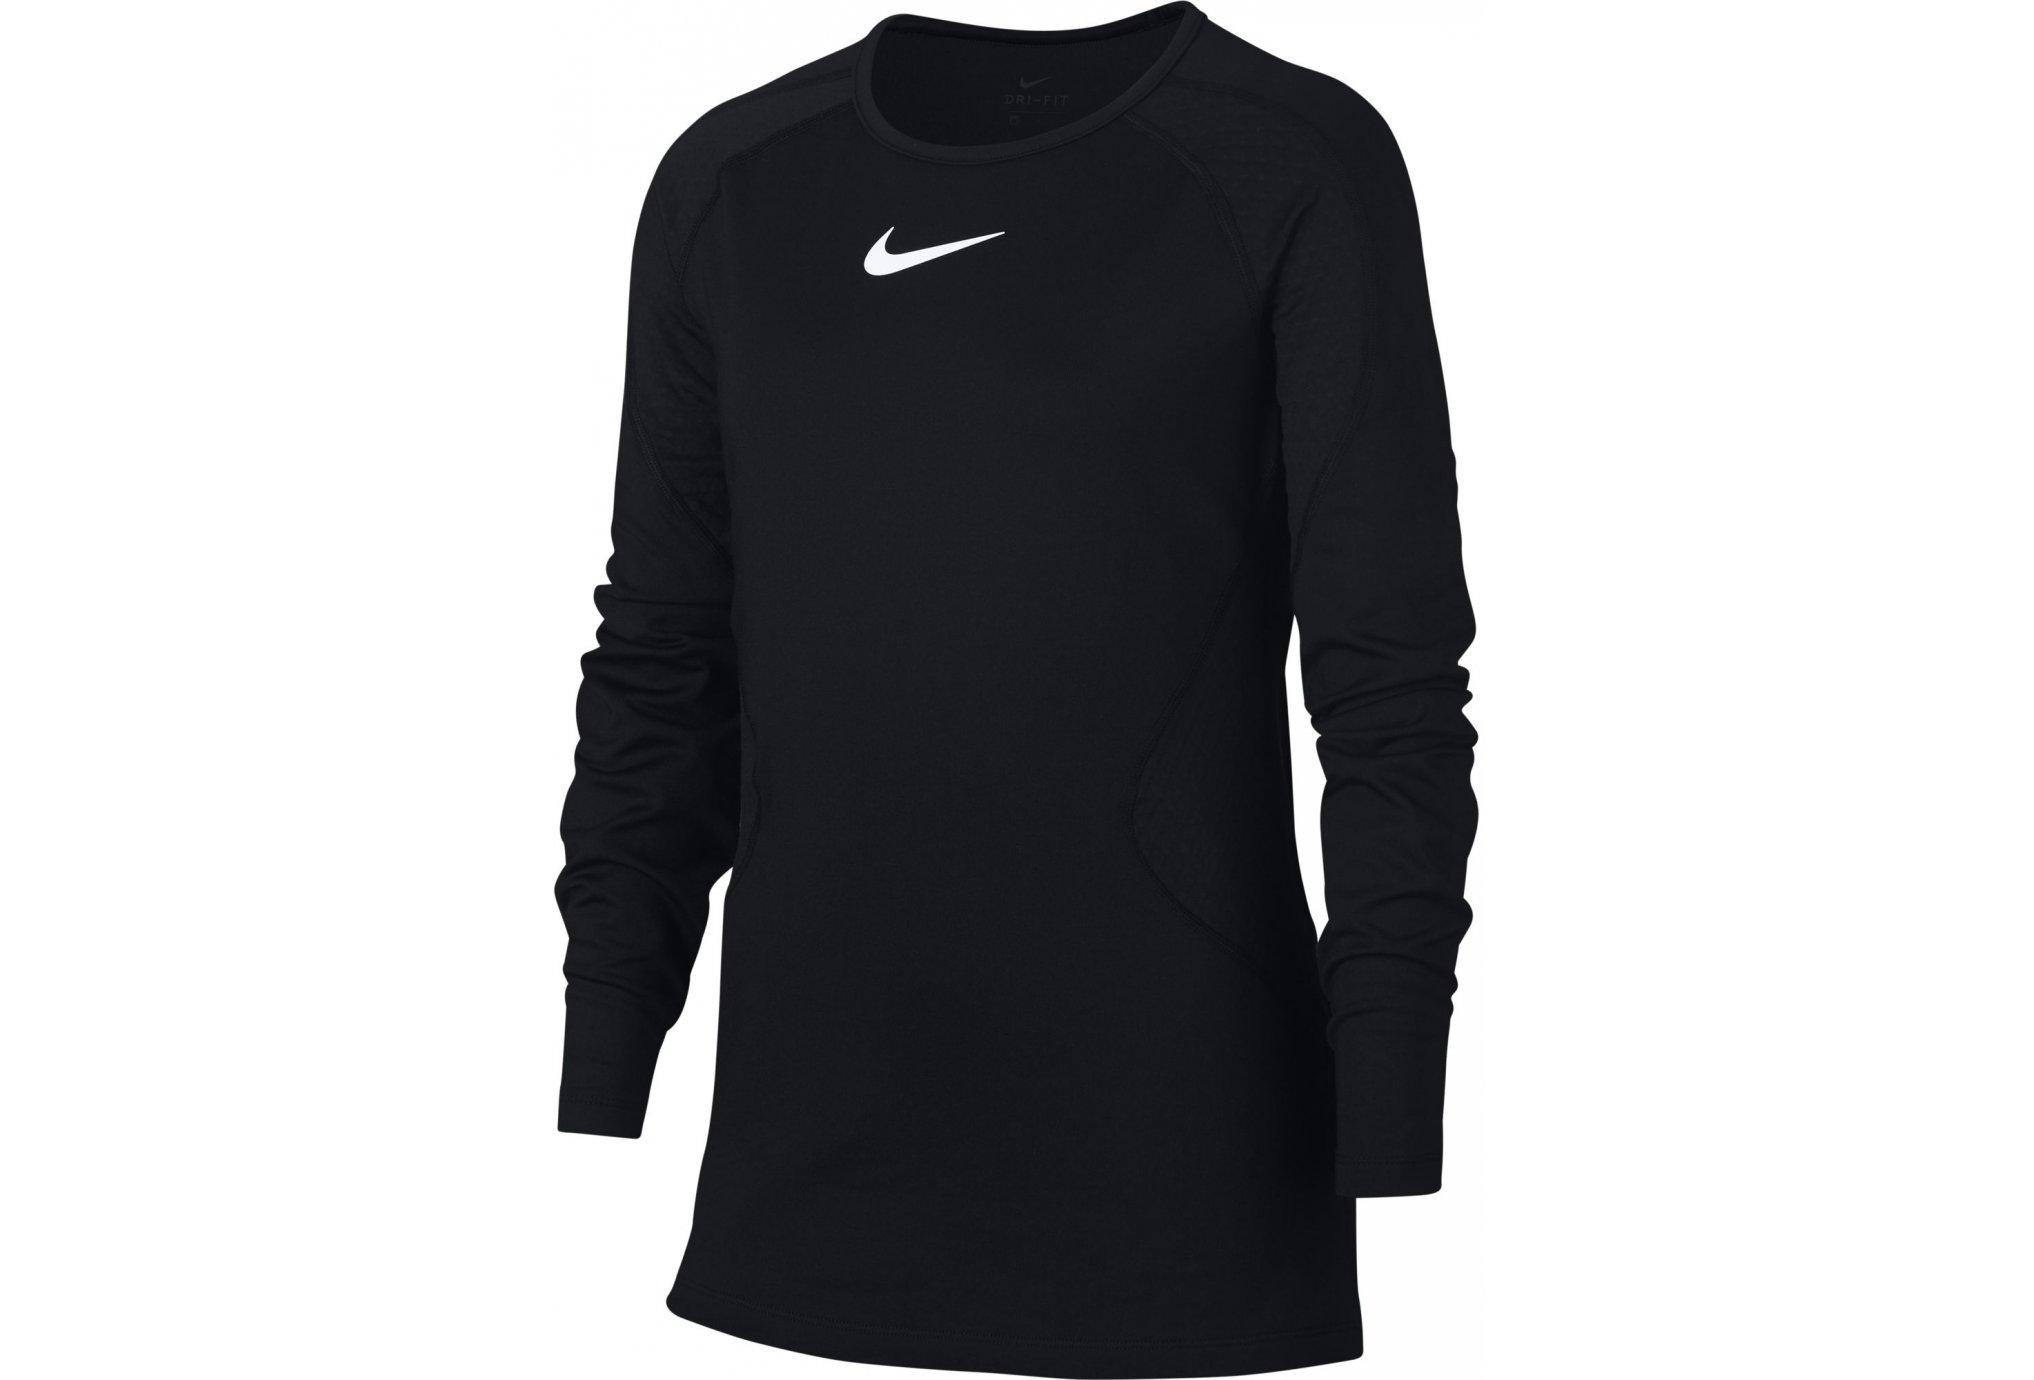 Nike Pro warm fille vêtement running femme